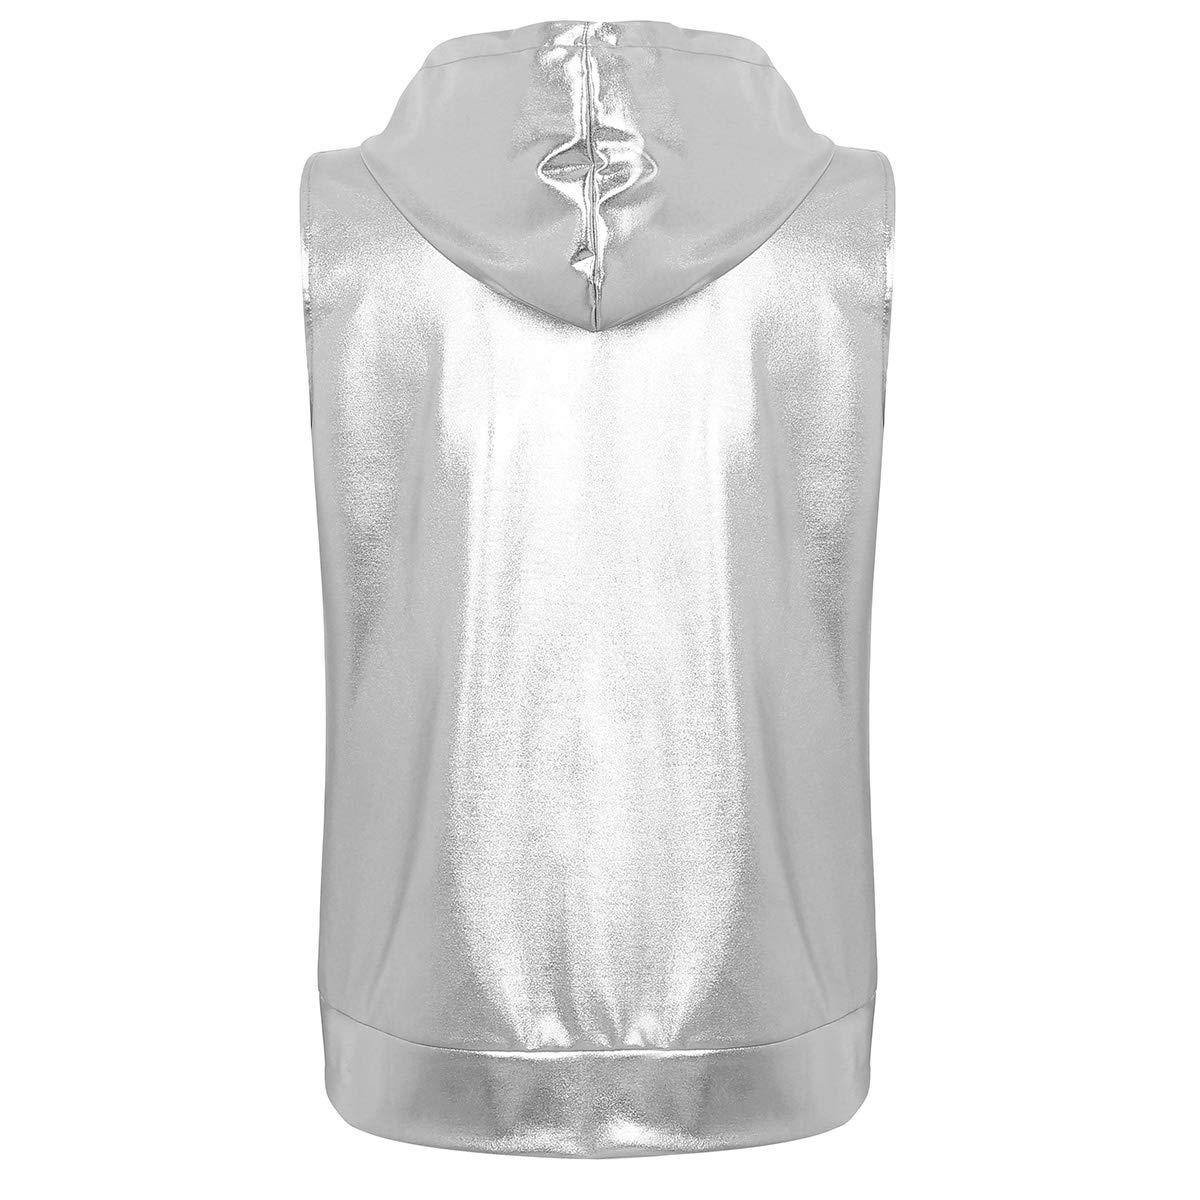 iiniim Sweats à Capuche Homme Jeune Garçon Gilet sans Manche Métallique  Brillants Sweat Shirt de Sport Veste de Danse Hippie Jazz Hip Hop Punk T  Shirt ... eb3ddb89d159